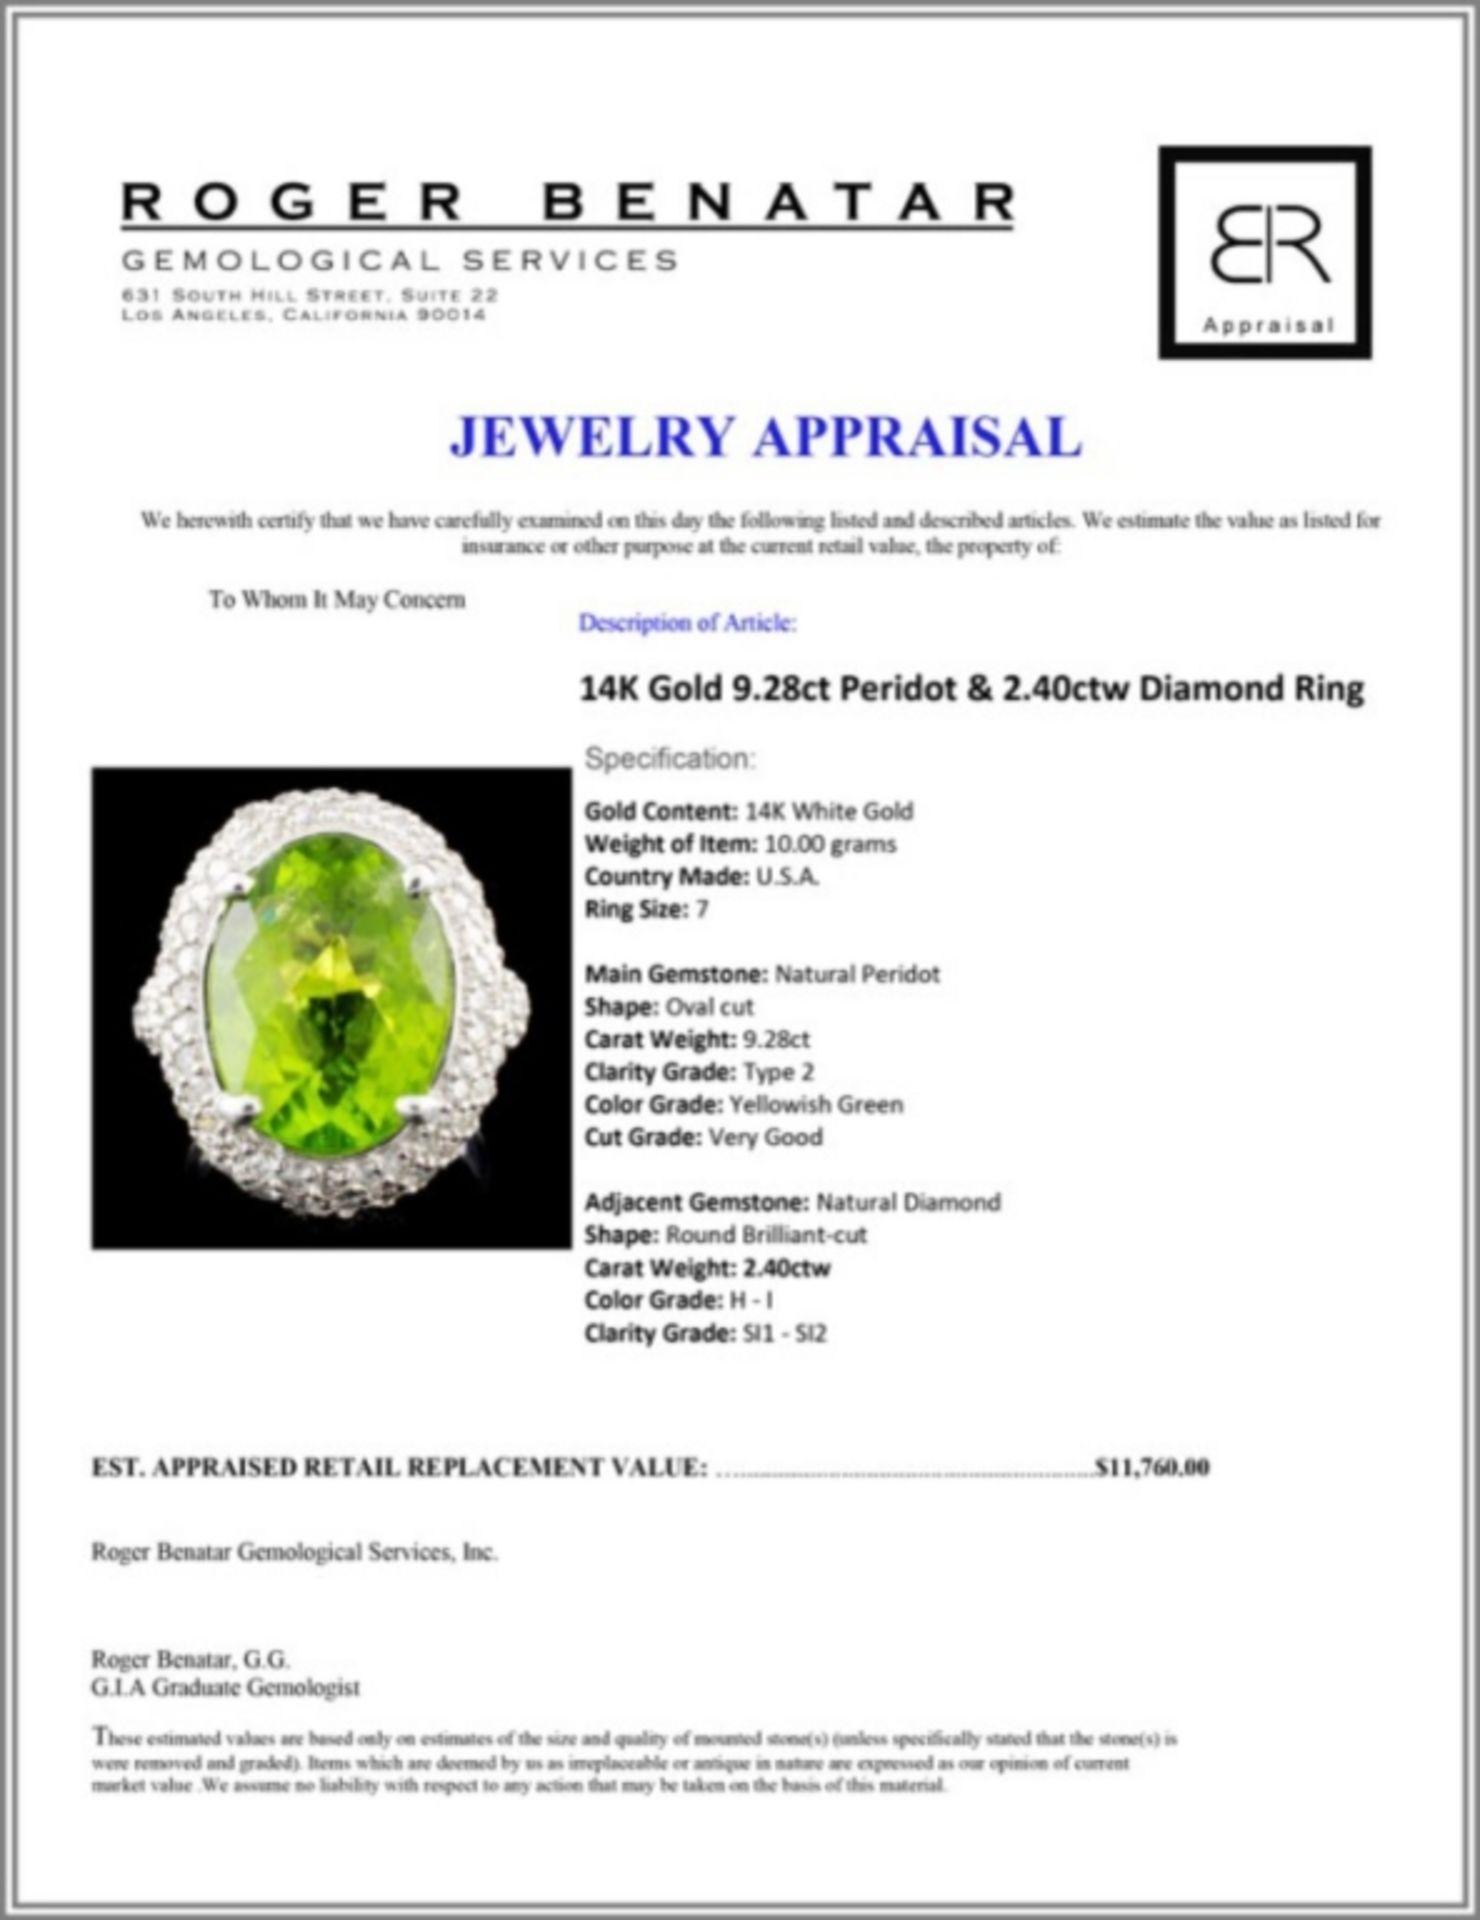 14K Gold 9.28ct Peridot & 2.40ctw Diamond Ring - Image 5 of 5